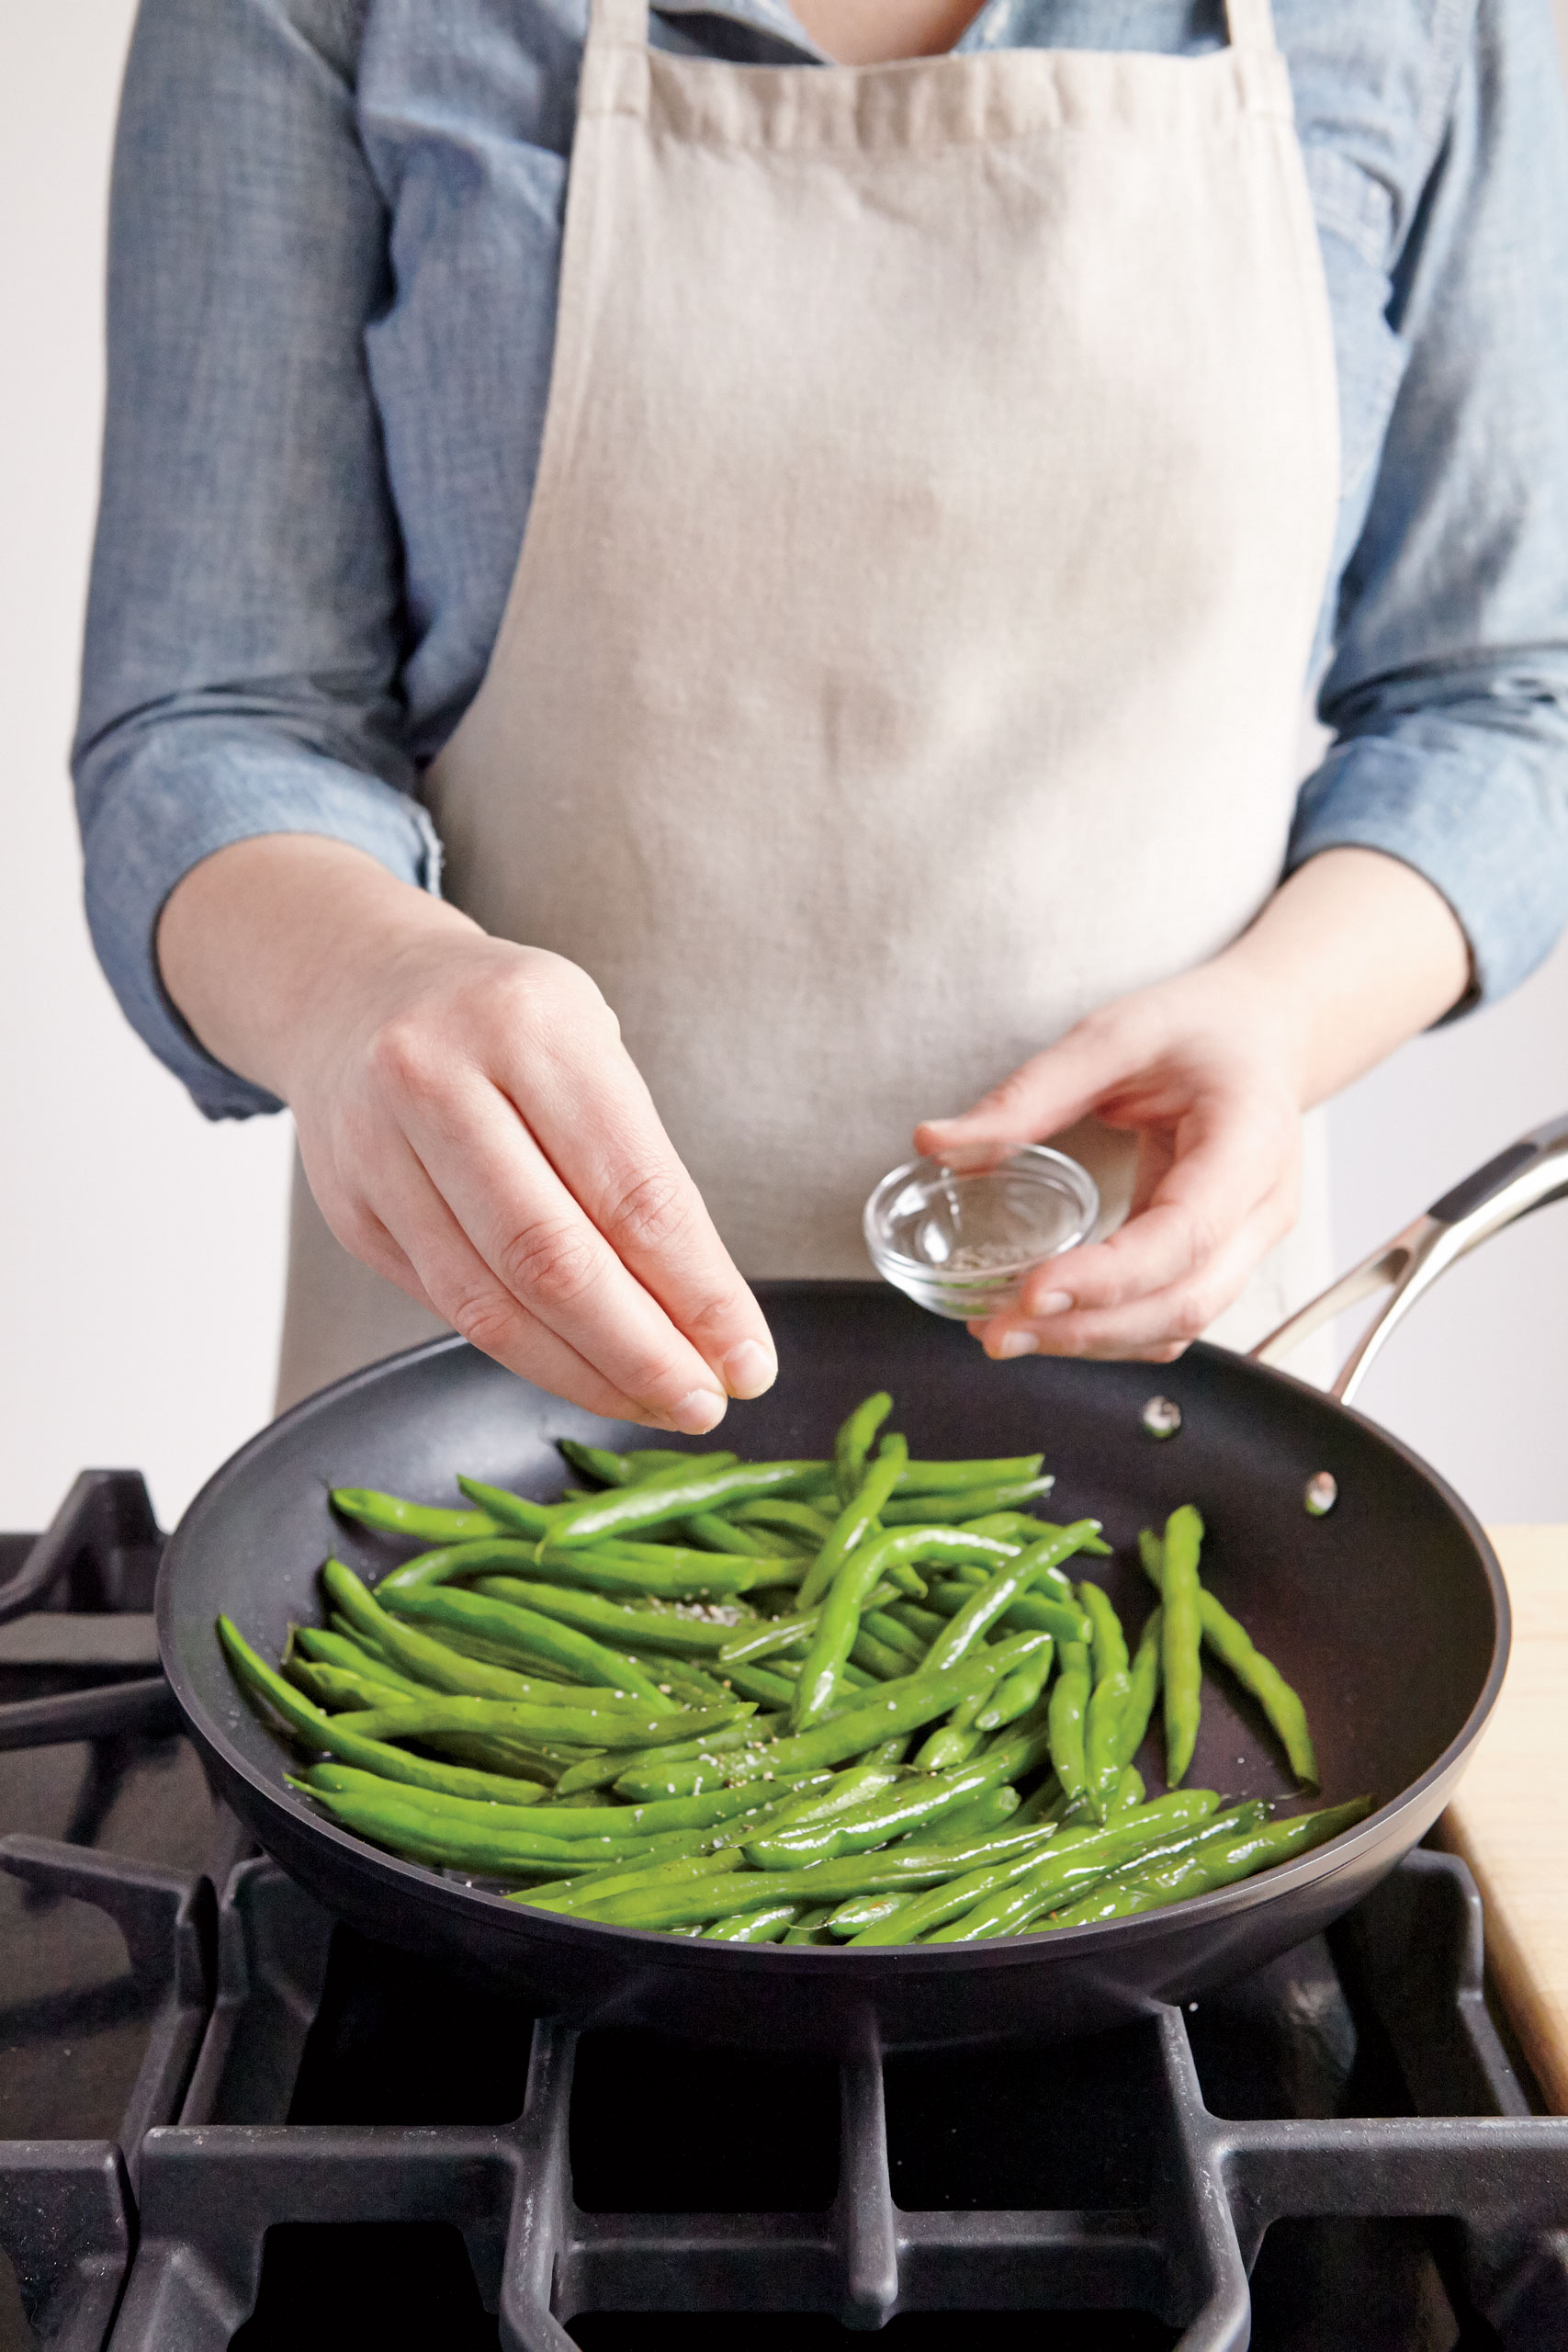 Flotus Michelle Obama Recipes: Green Beans